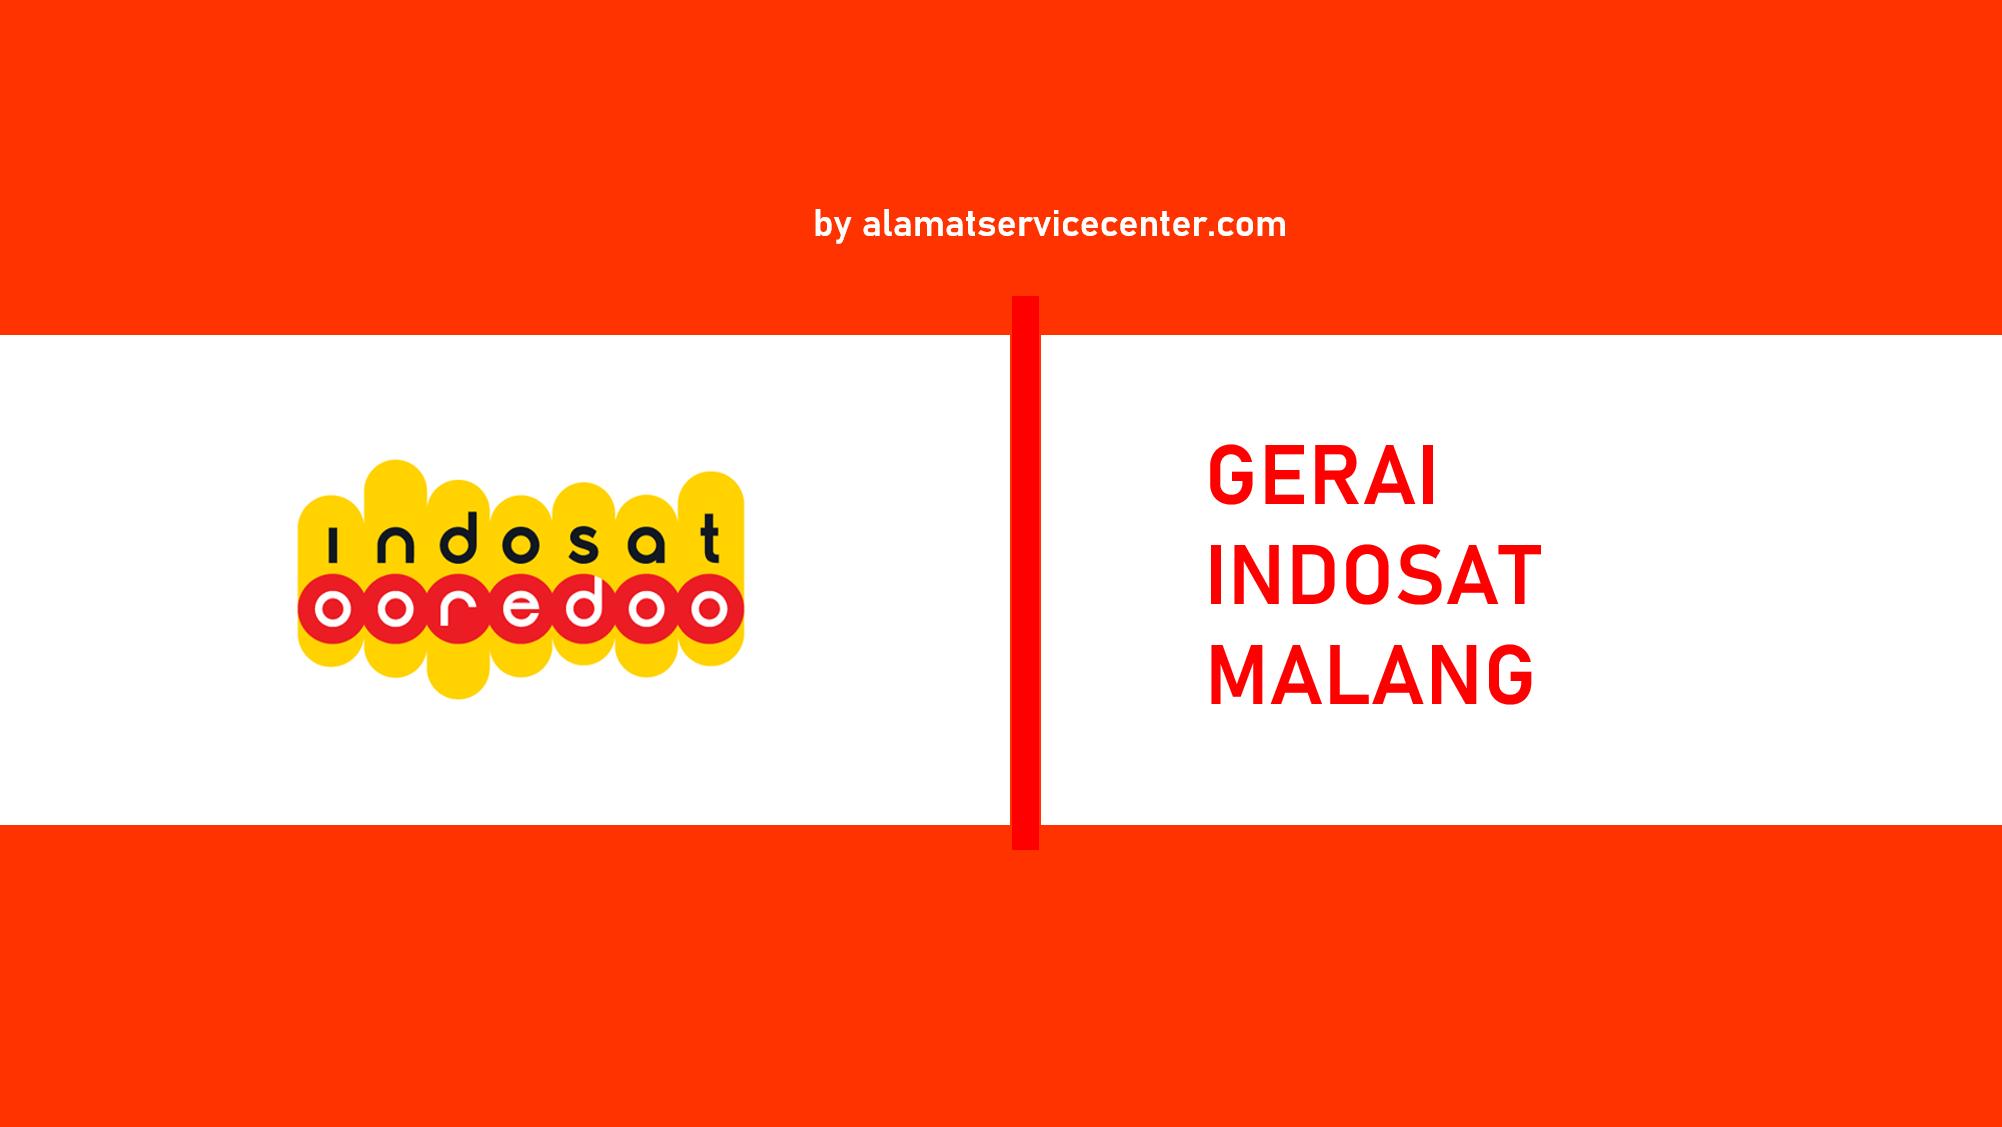 Gerai Indosat Malang